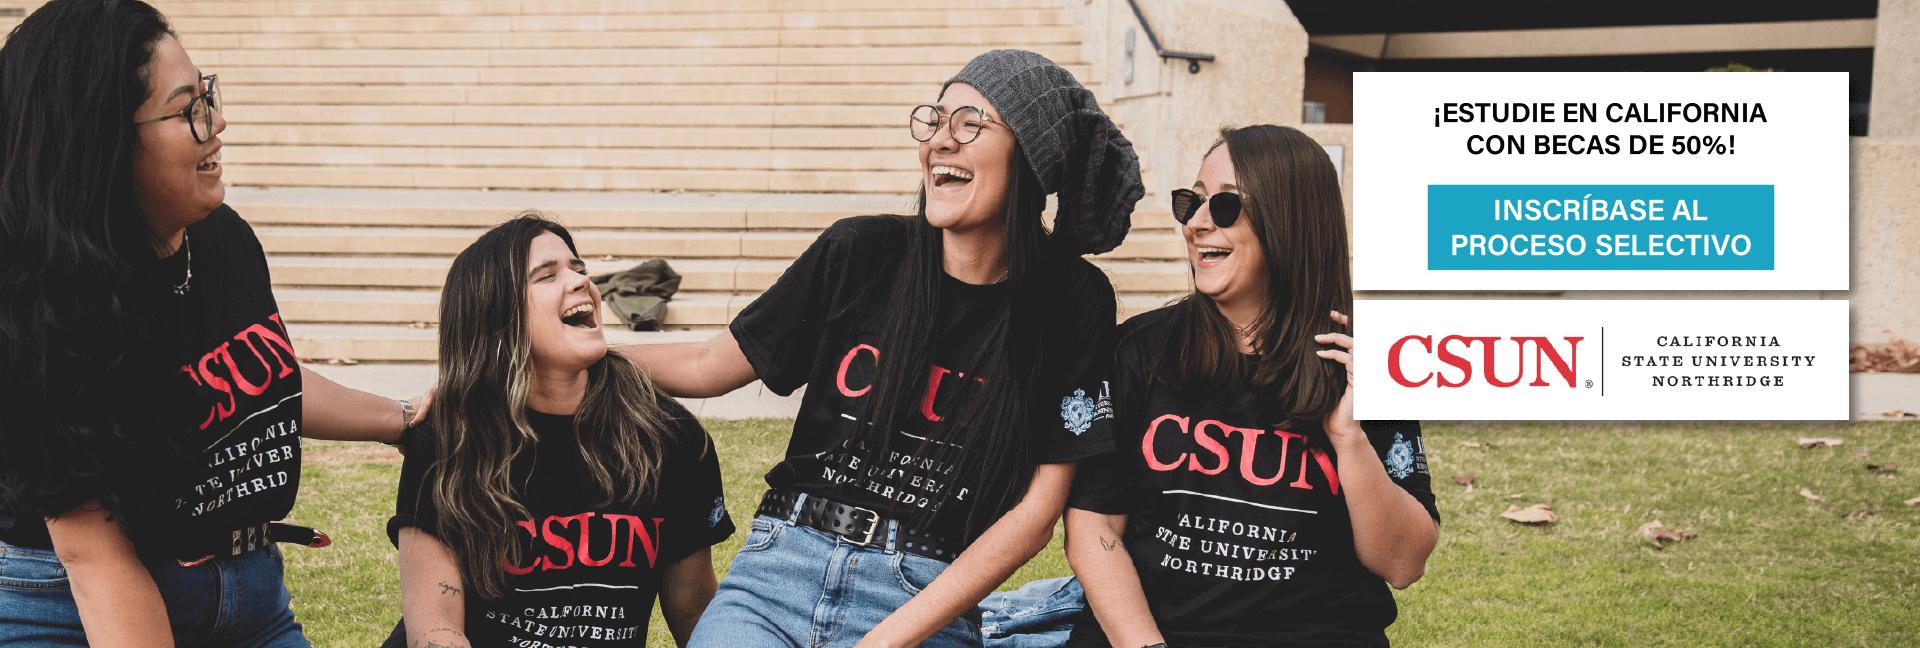 ¡Estudie en CSUN!